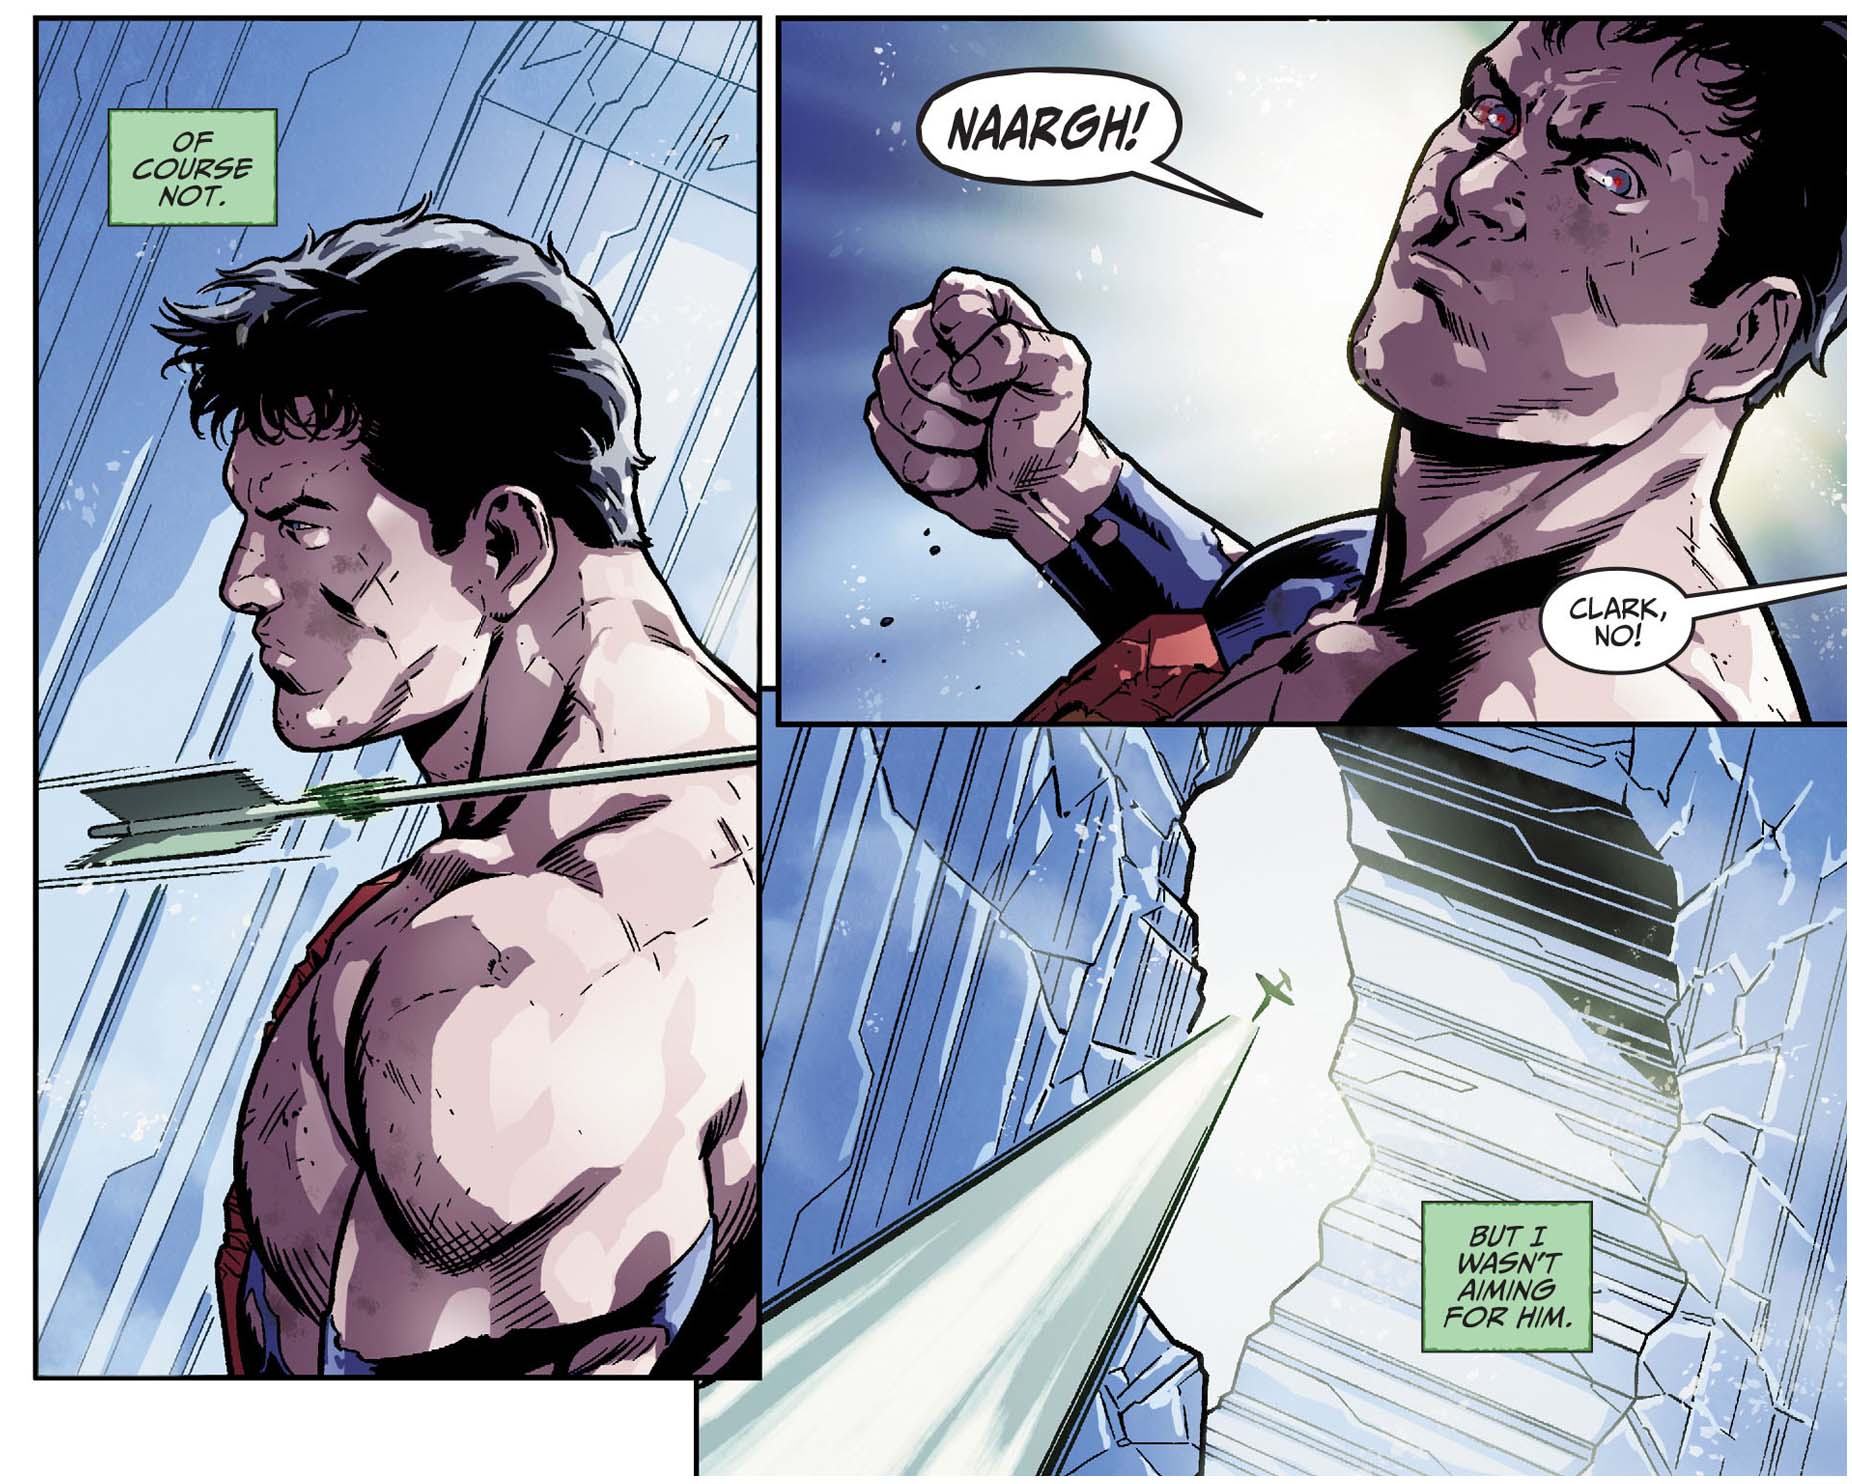 Wonder woman vs spiderman 8